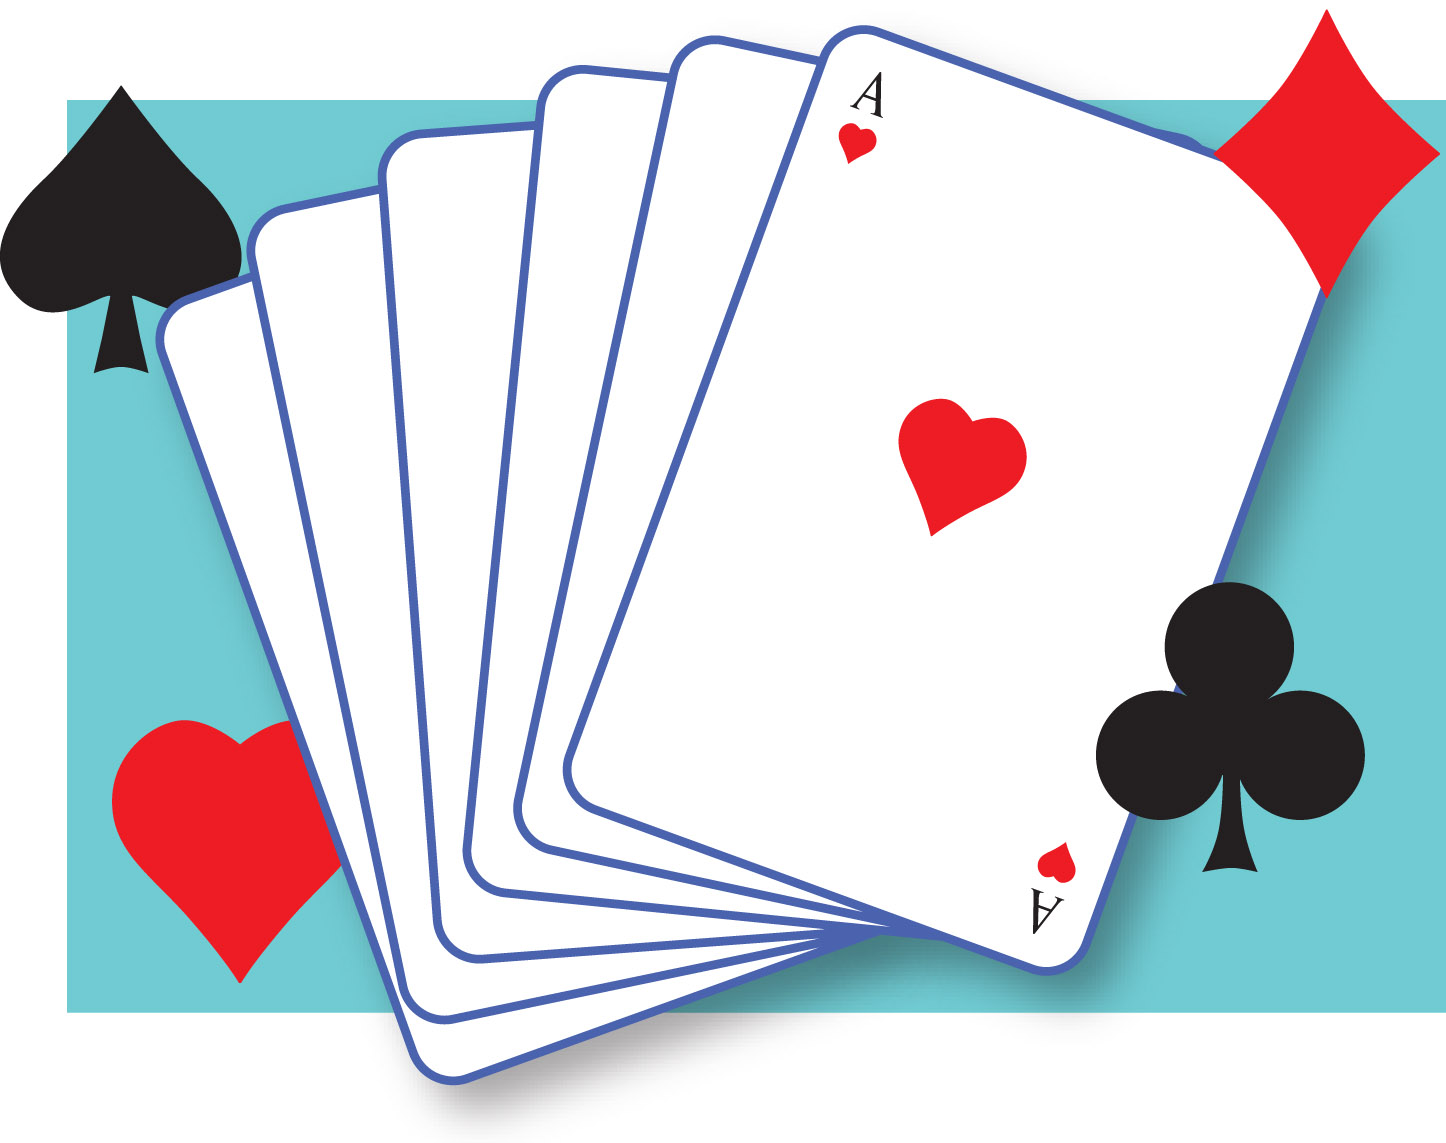 Game clipart bridge game. Free cliparts download clip